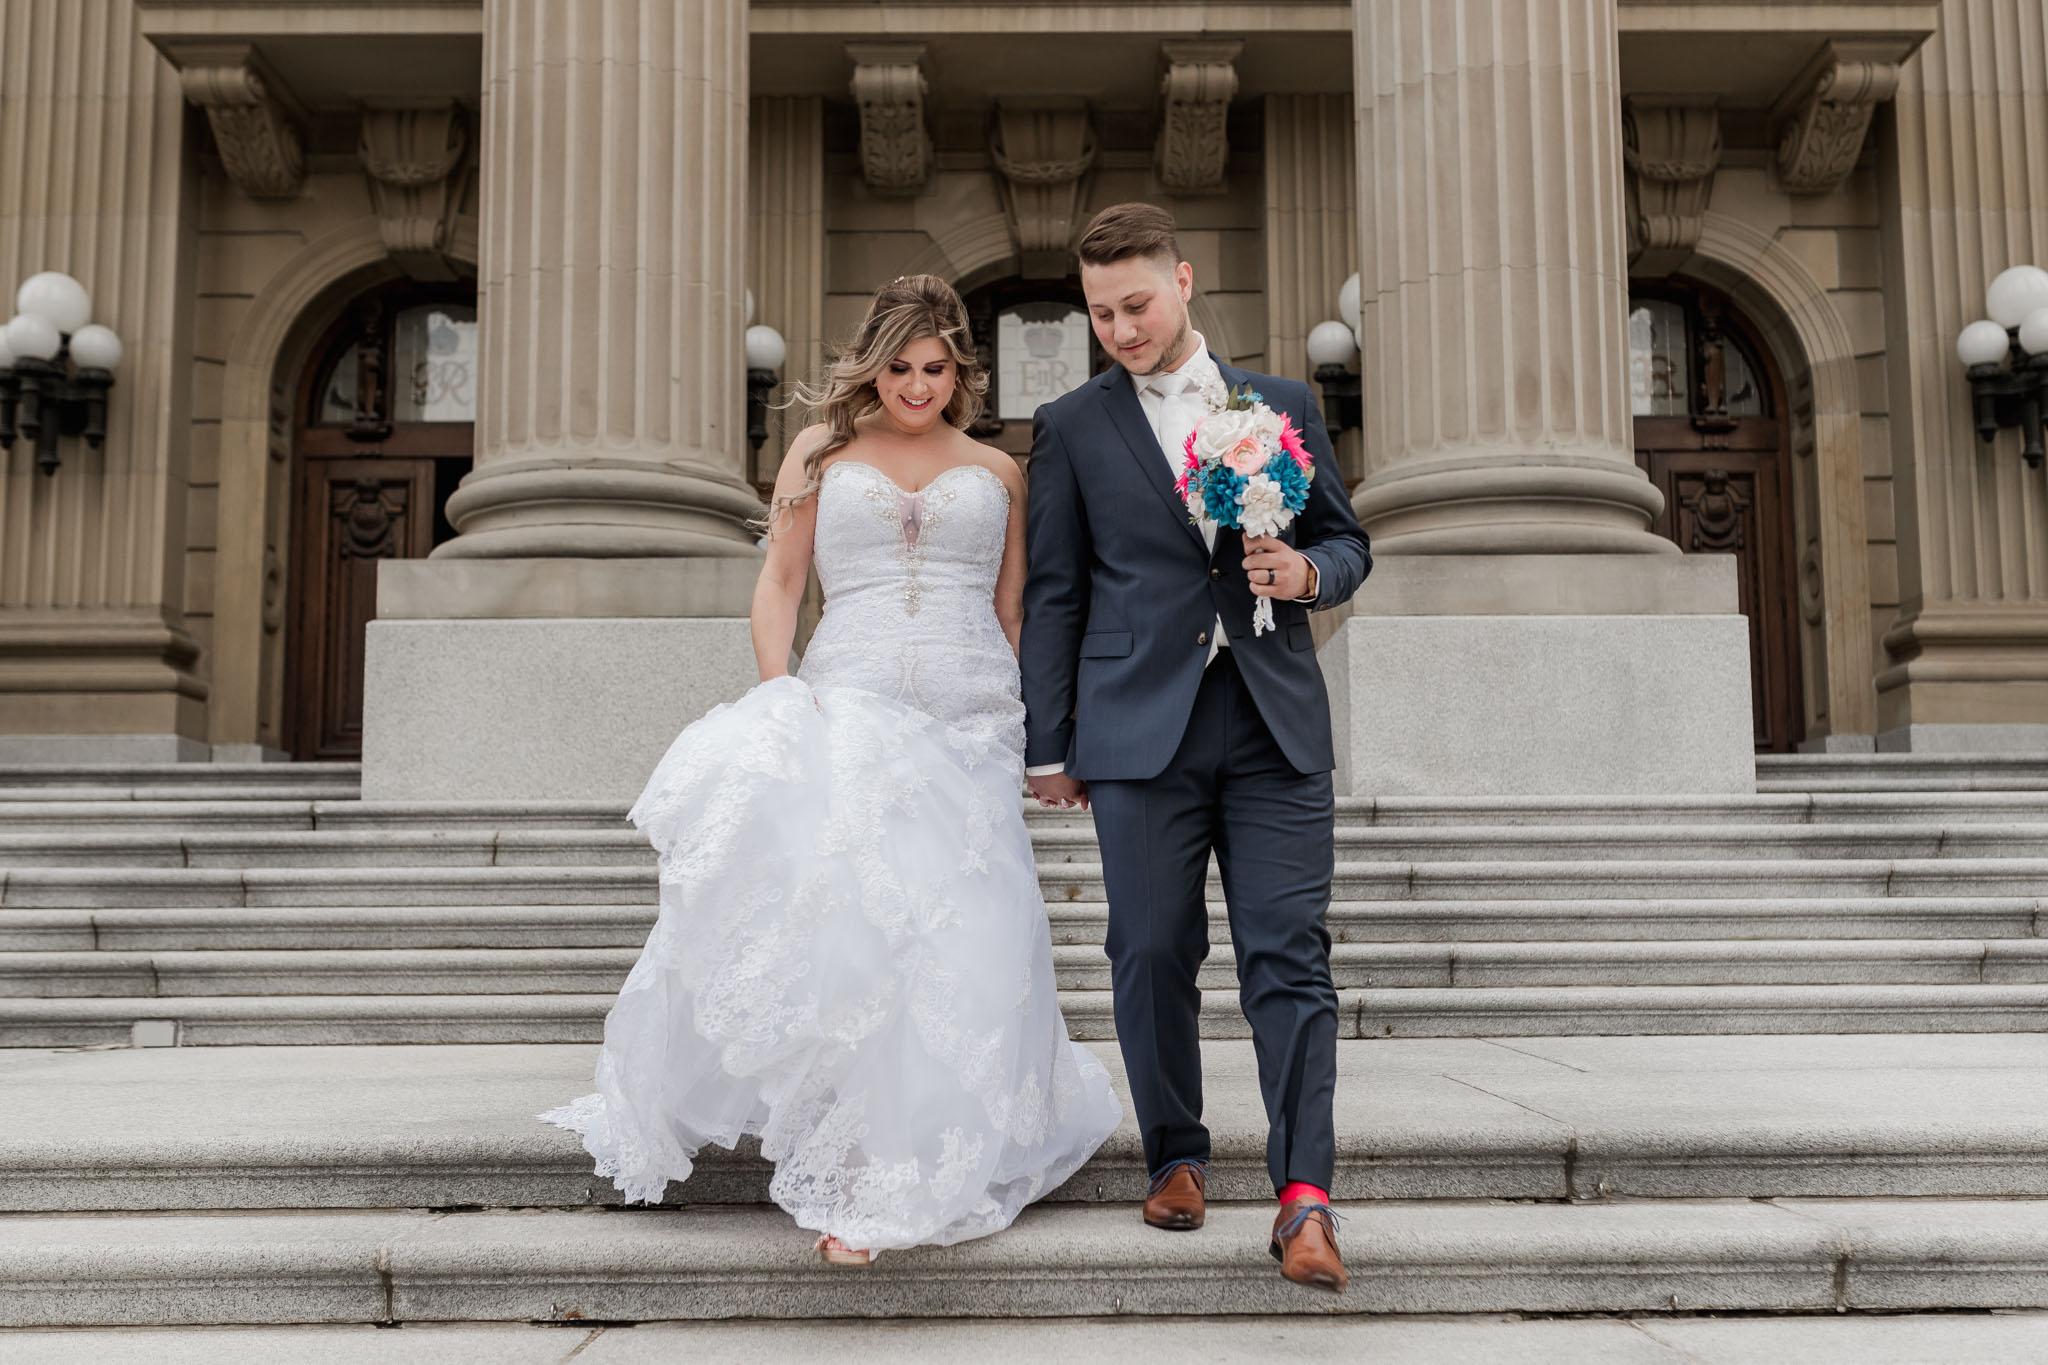 Wedding Photos At the Legislature